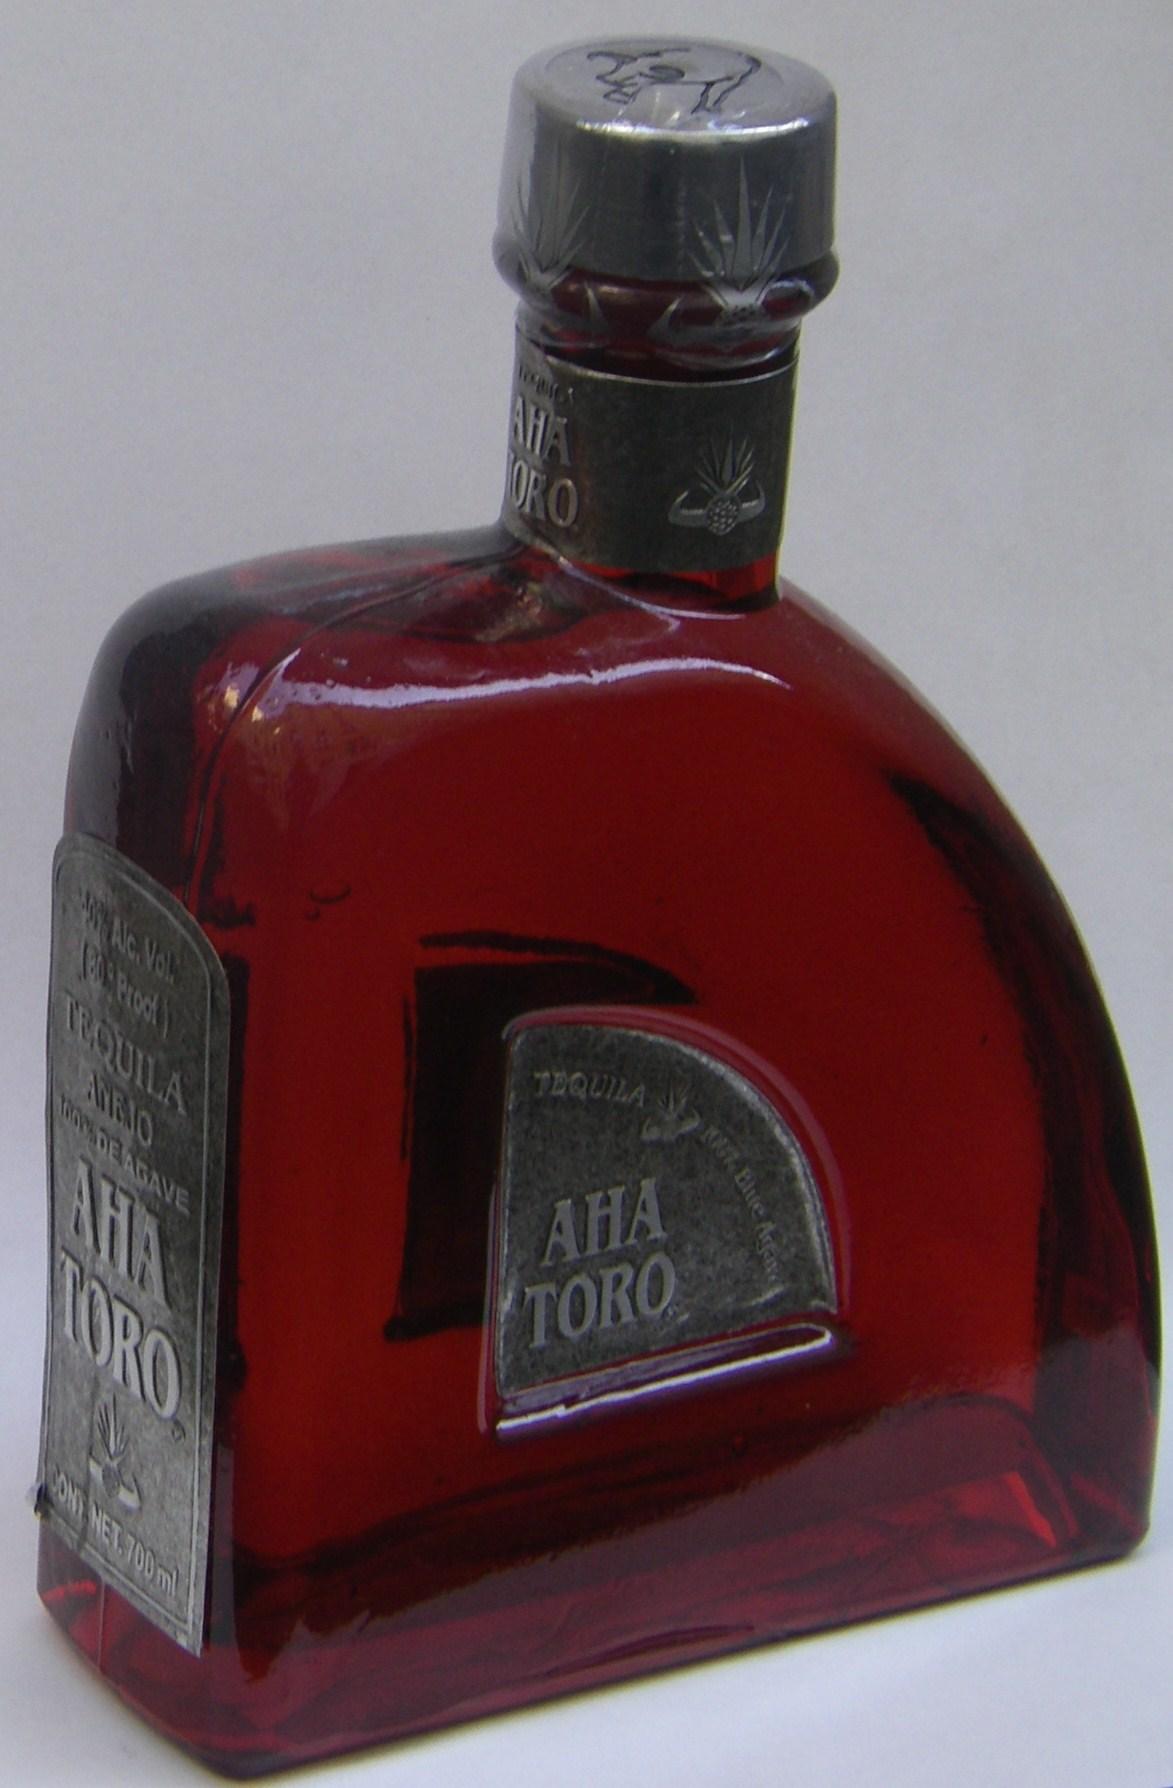 Tequila Aha Toro Wikipedia